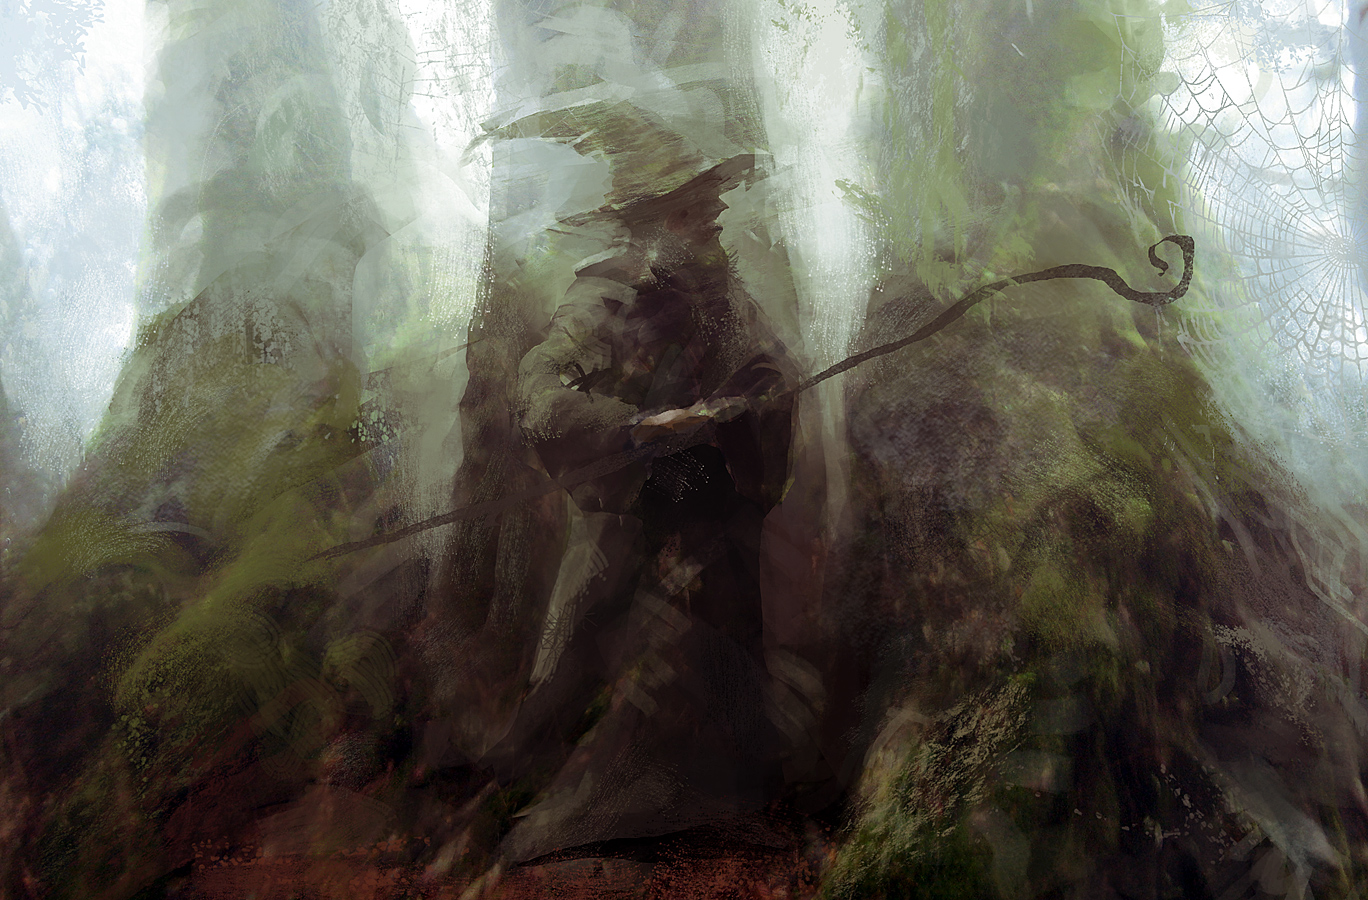 gandalf by leventep 1368x900